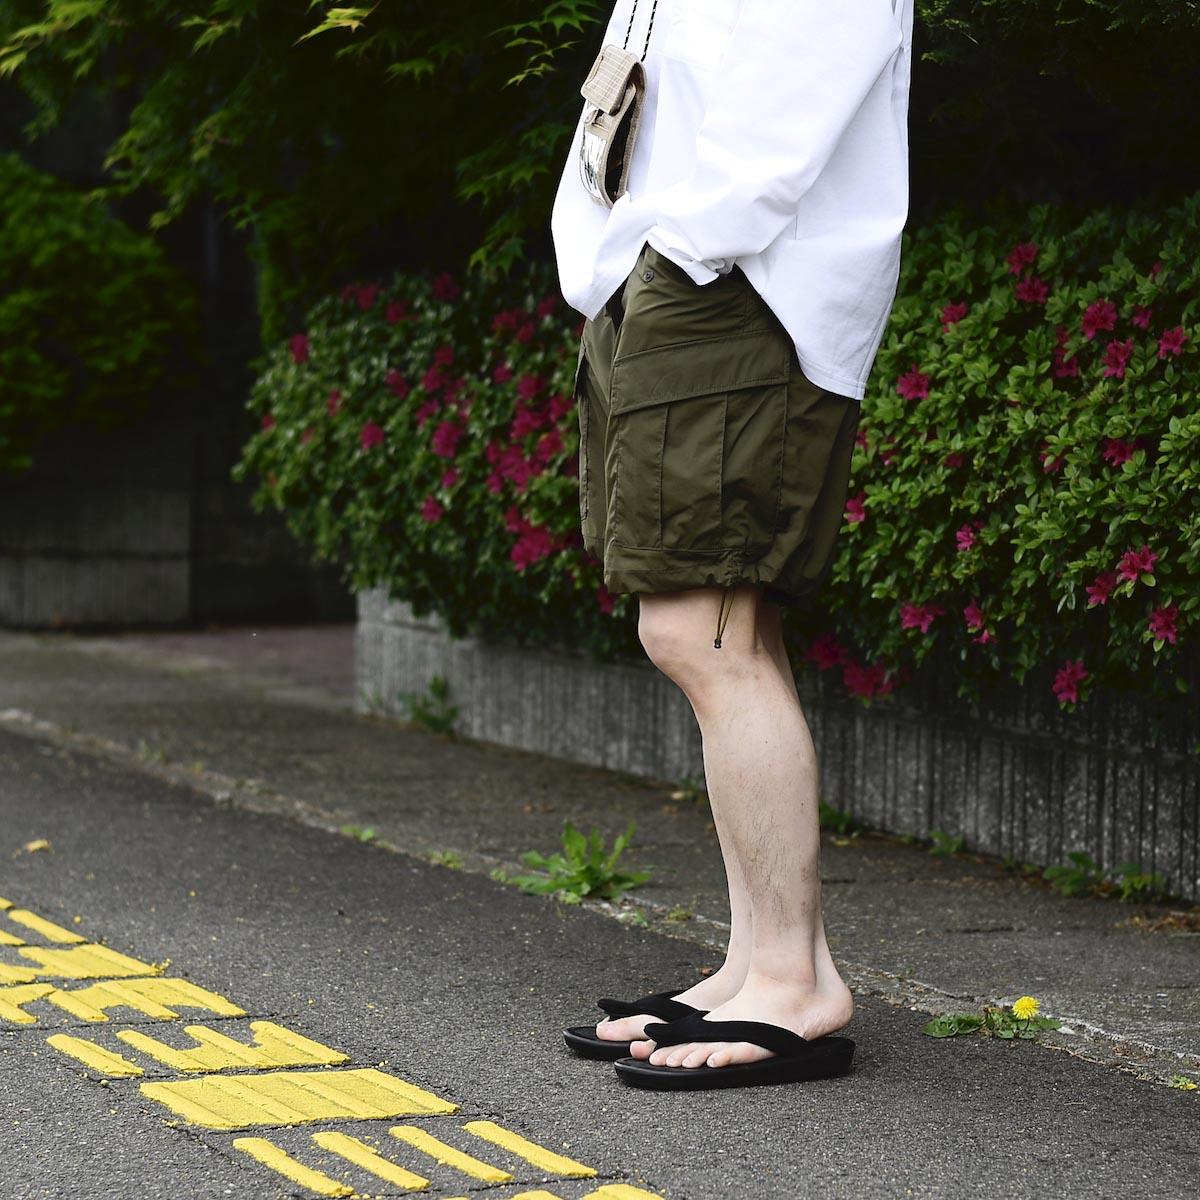 DAIWA PIER39 / Micro Rip-Stop Easy 6P Shorts (Black)着用イメージ (162cm Msize)